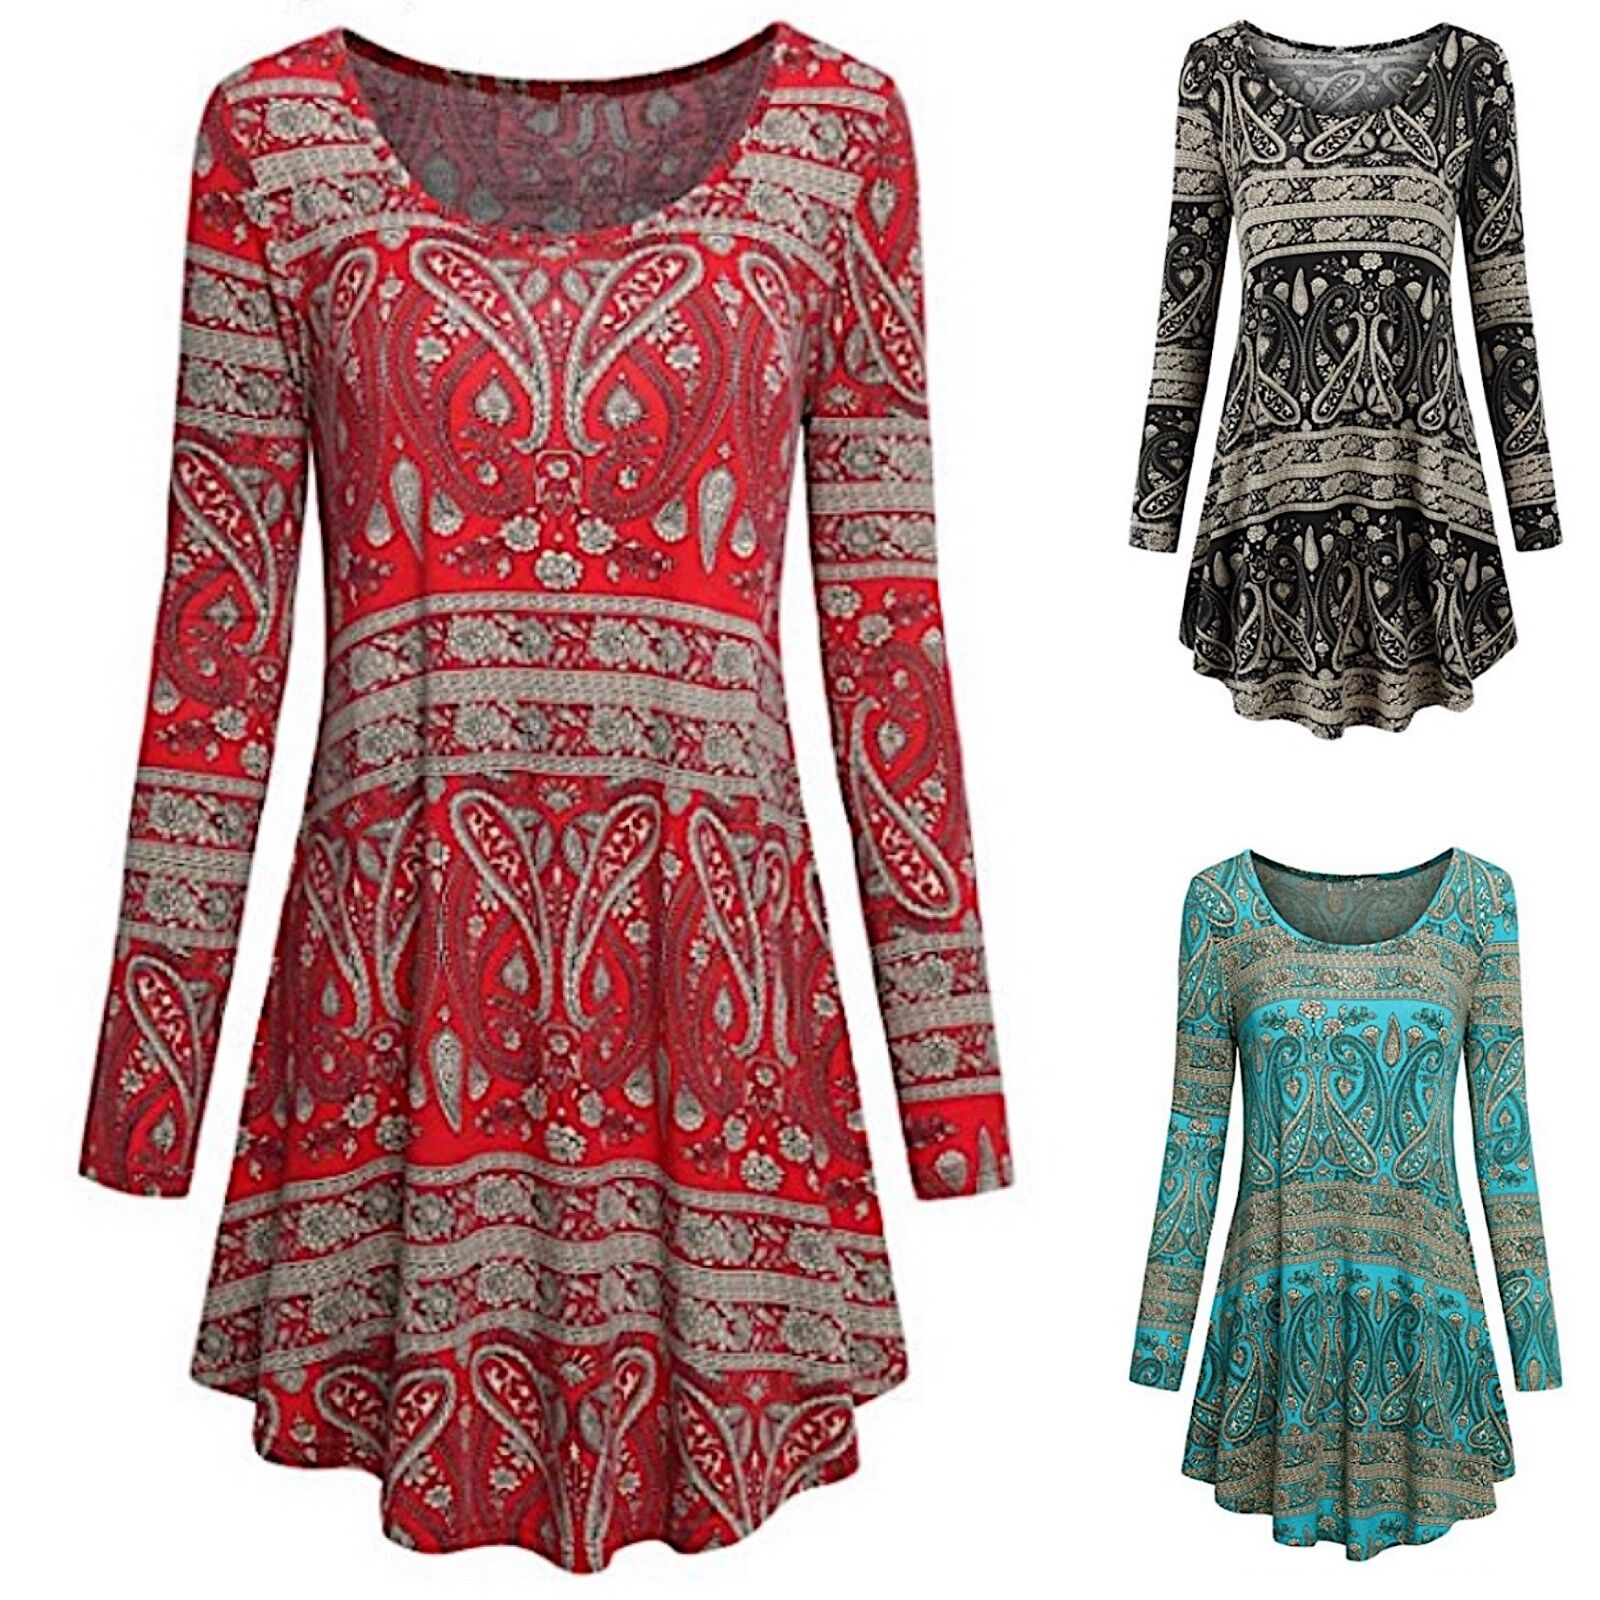 Maglia damen Stampa Etnica Manica Lunga Woman Long Sleeve T-Hemd 561043 P